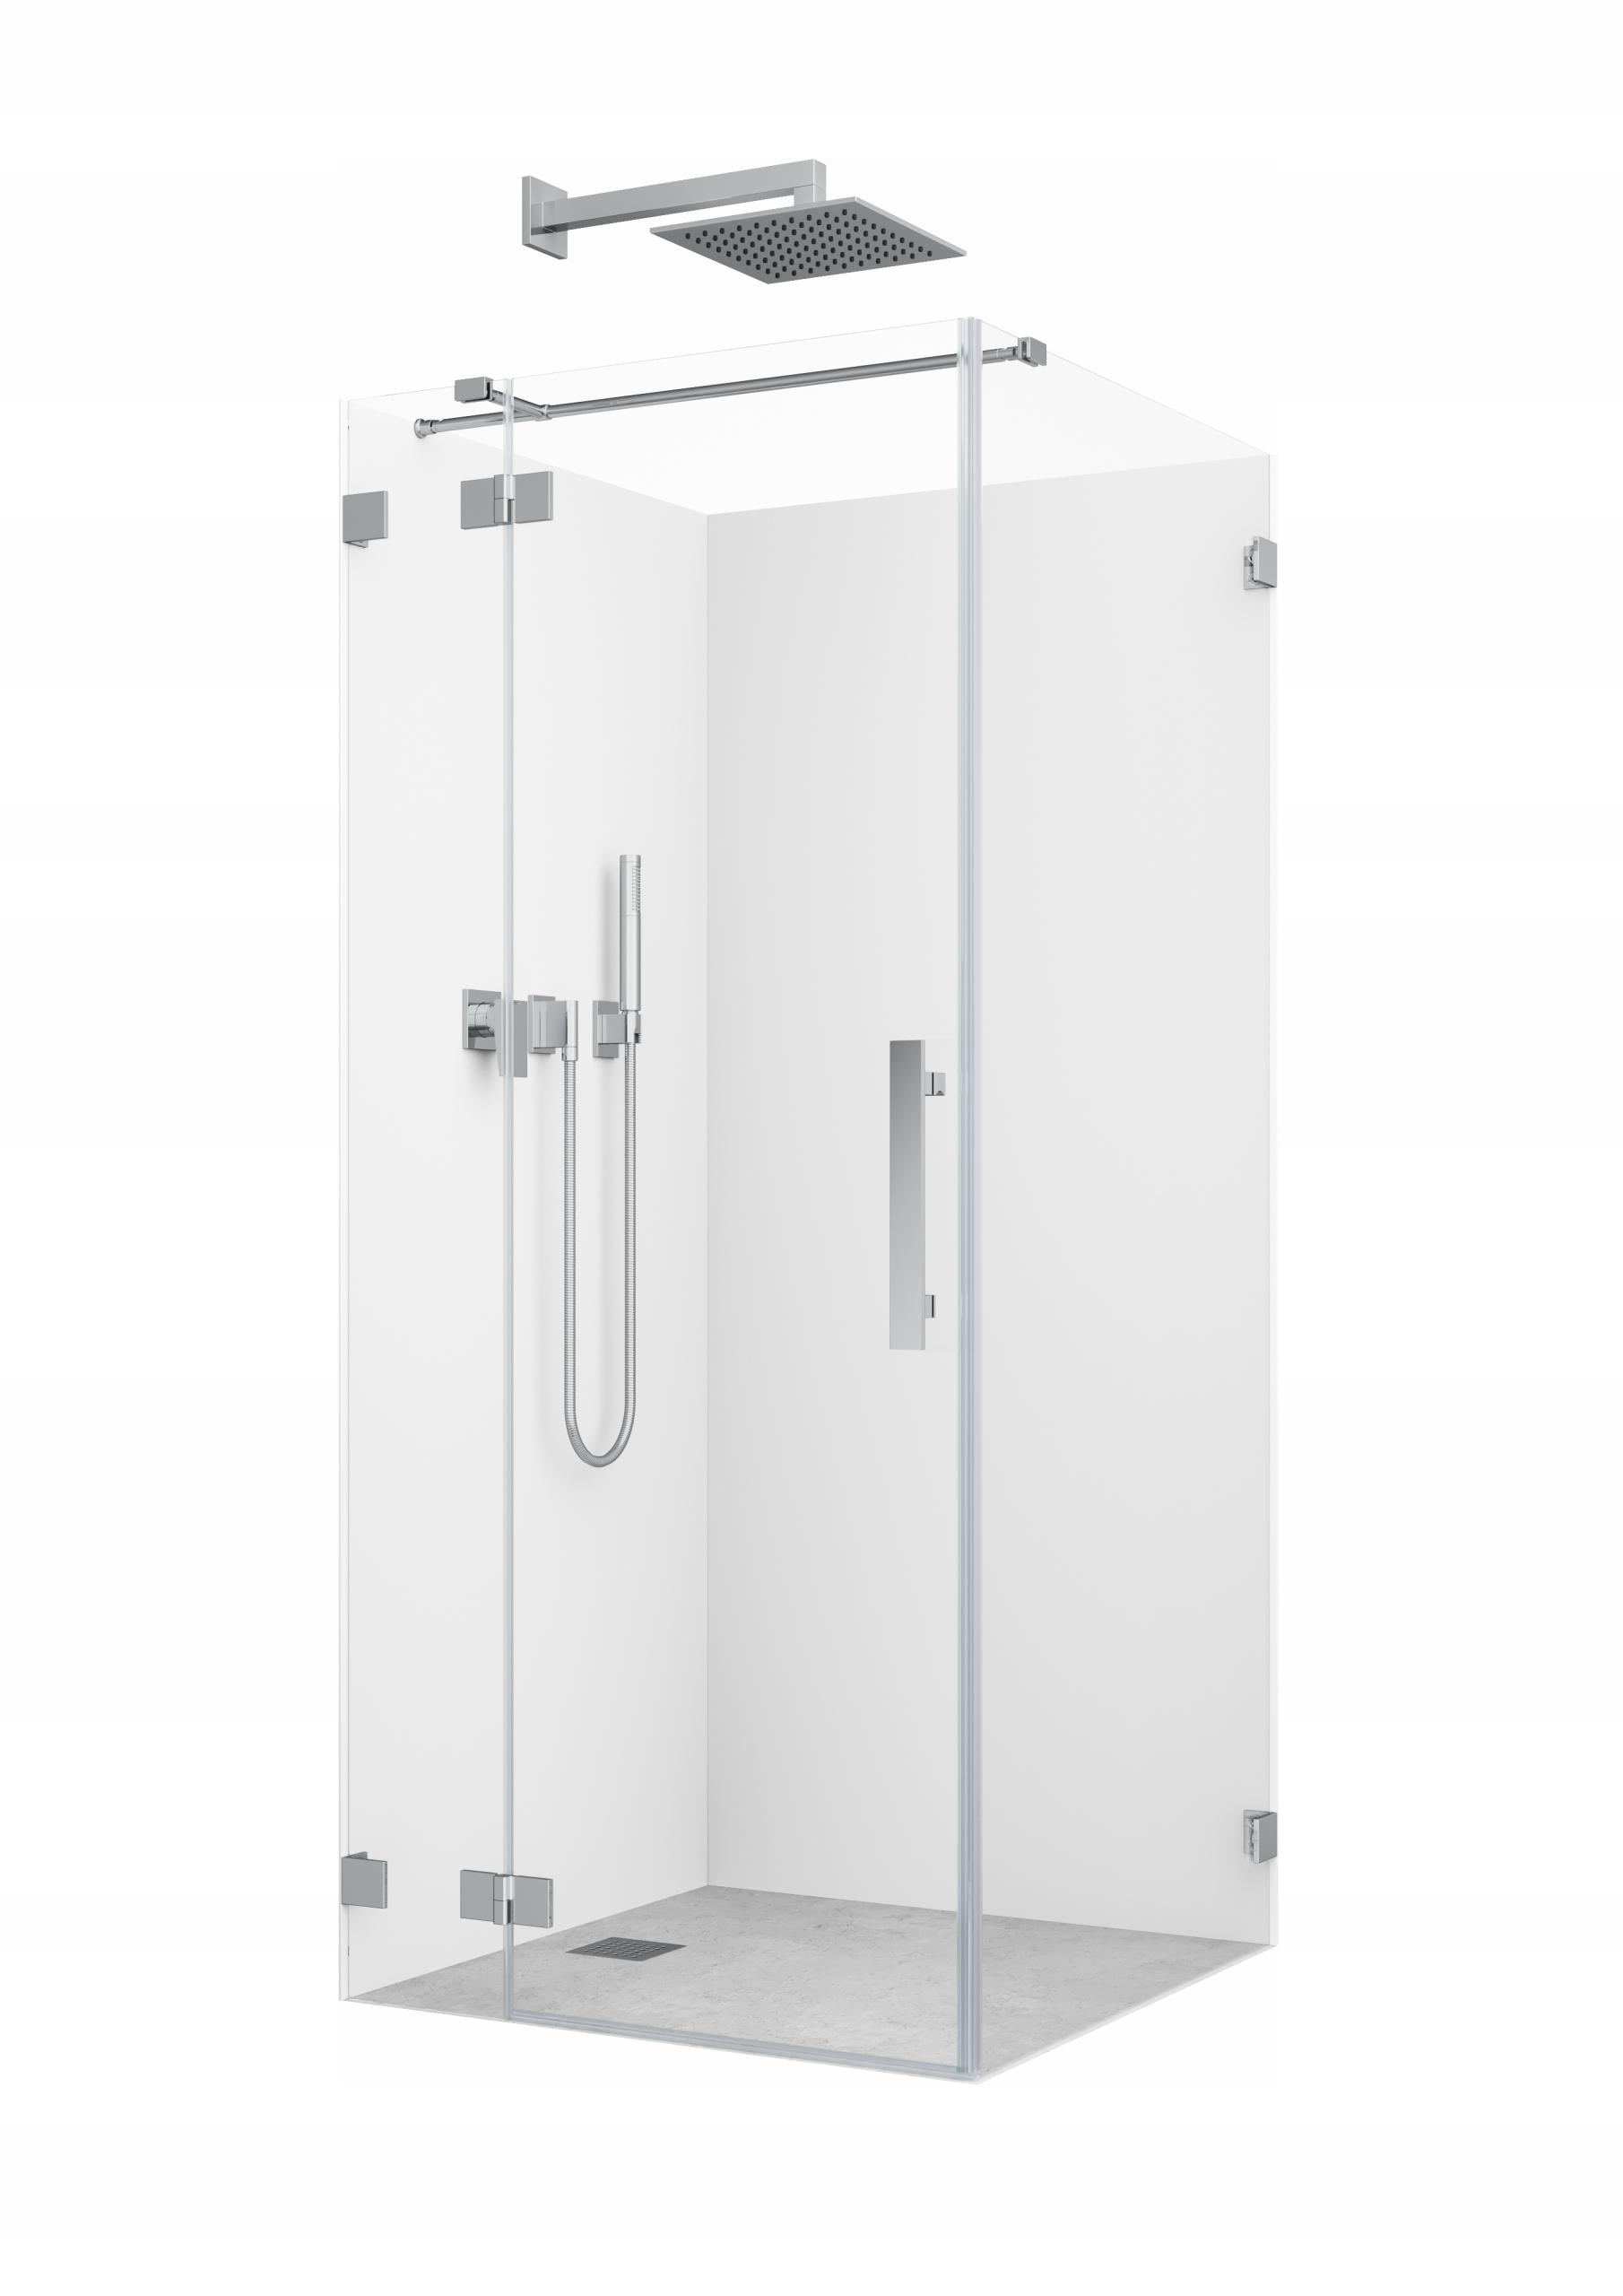 Sprchové dvere L 110x110 Aquante Disenio